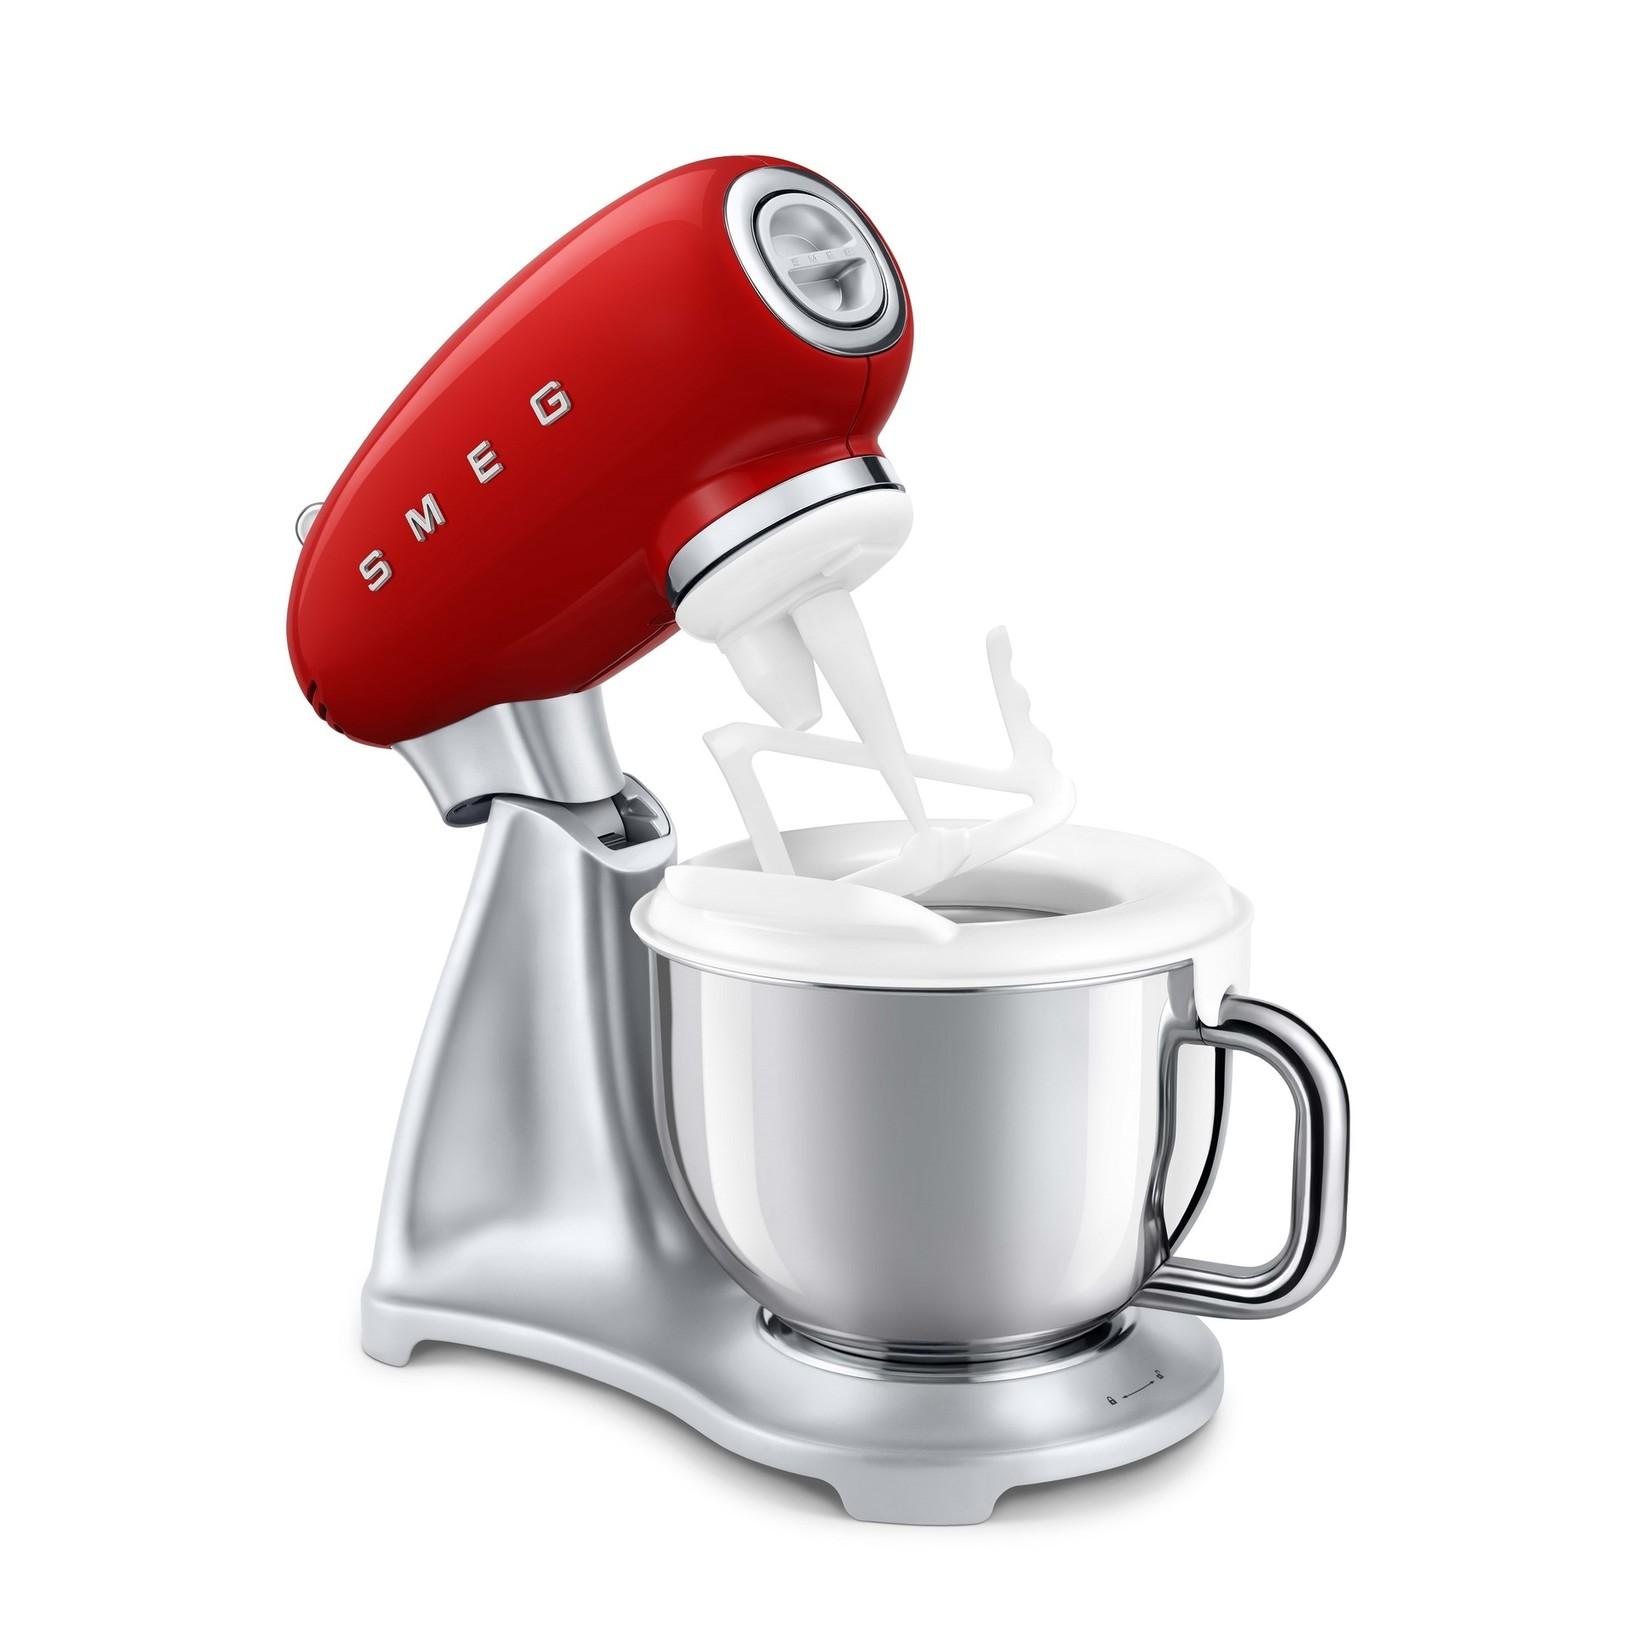 Smeg Smeg SMIC01 ijsmaker voor keukenmachine